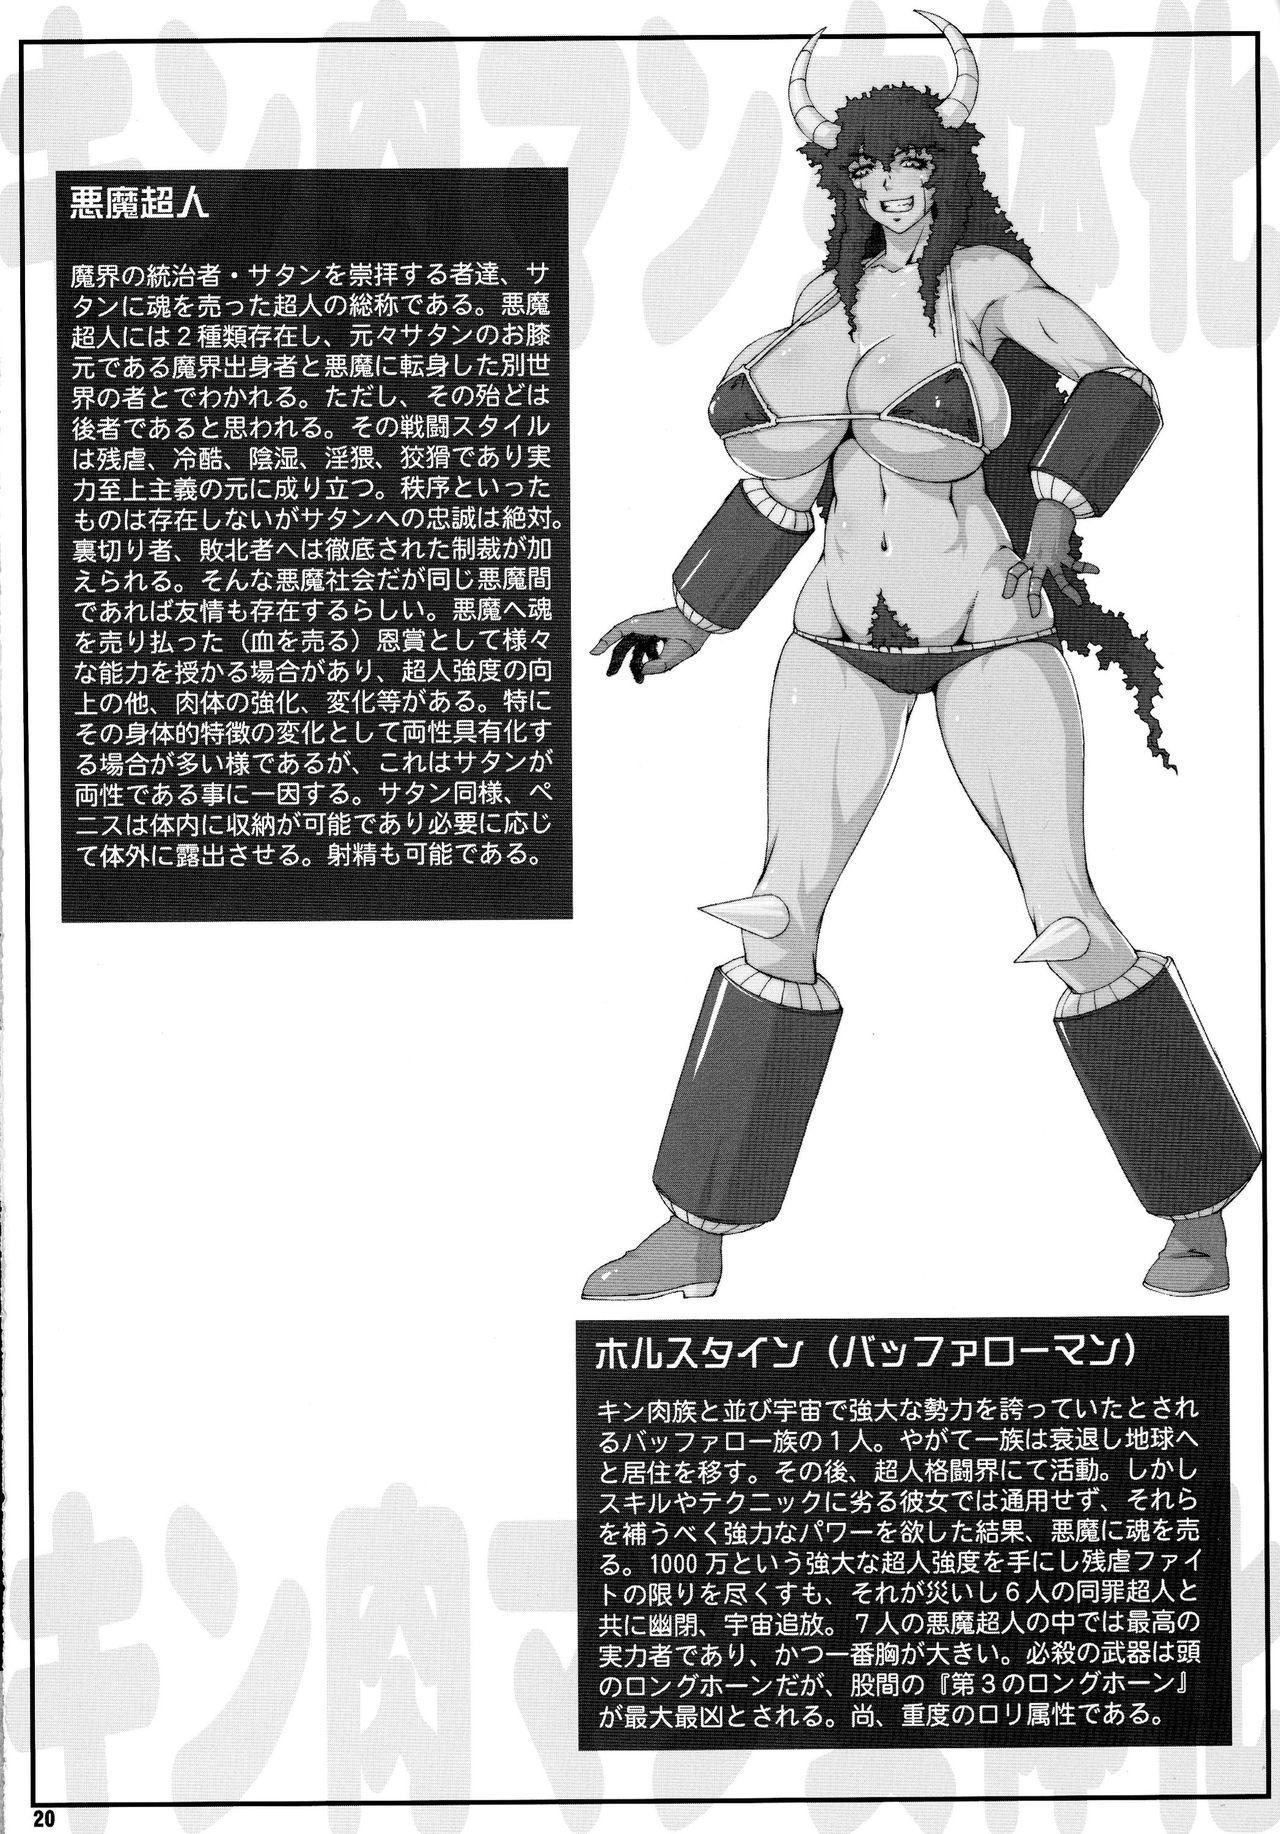 Misoka no 5 19